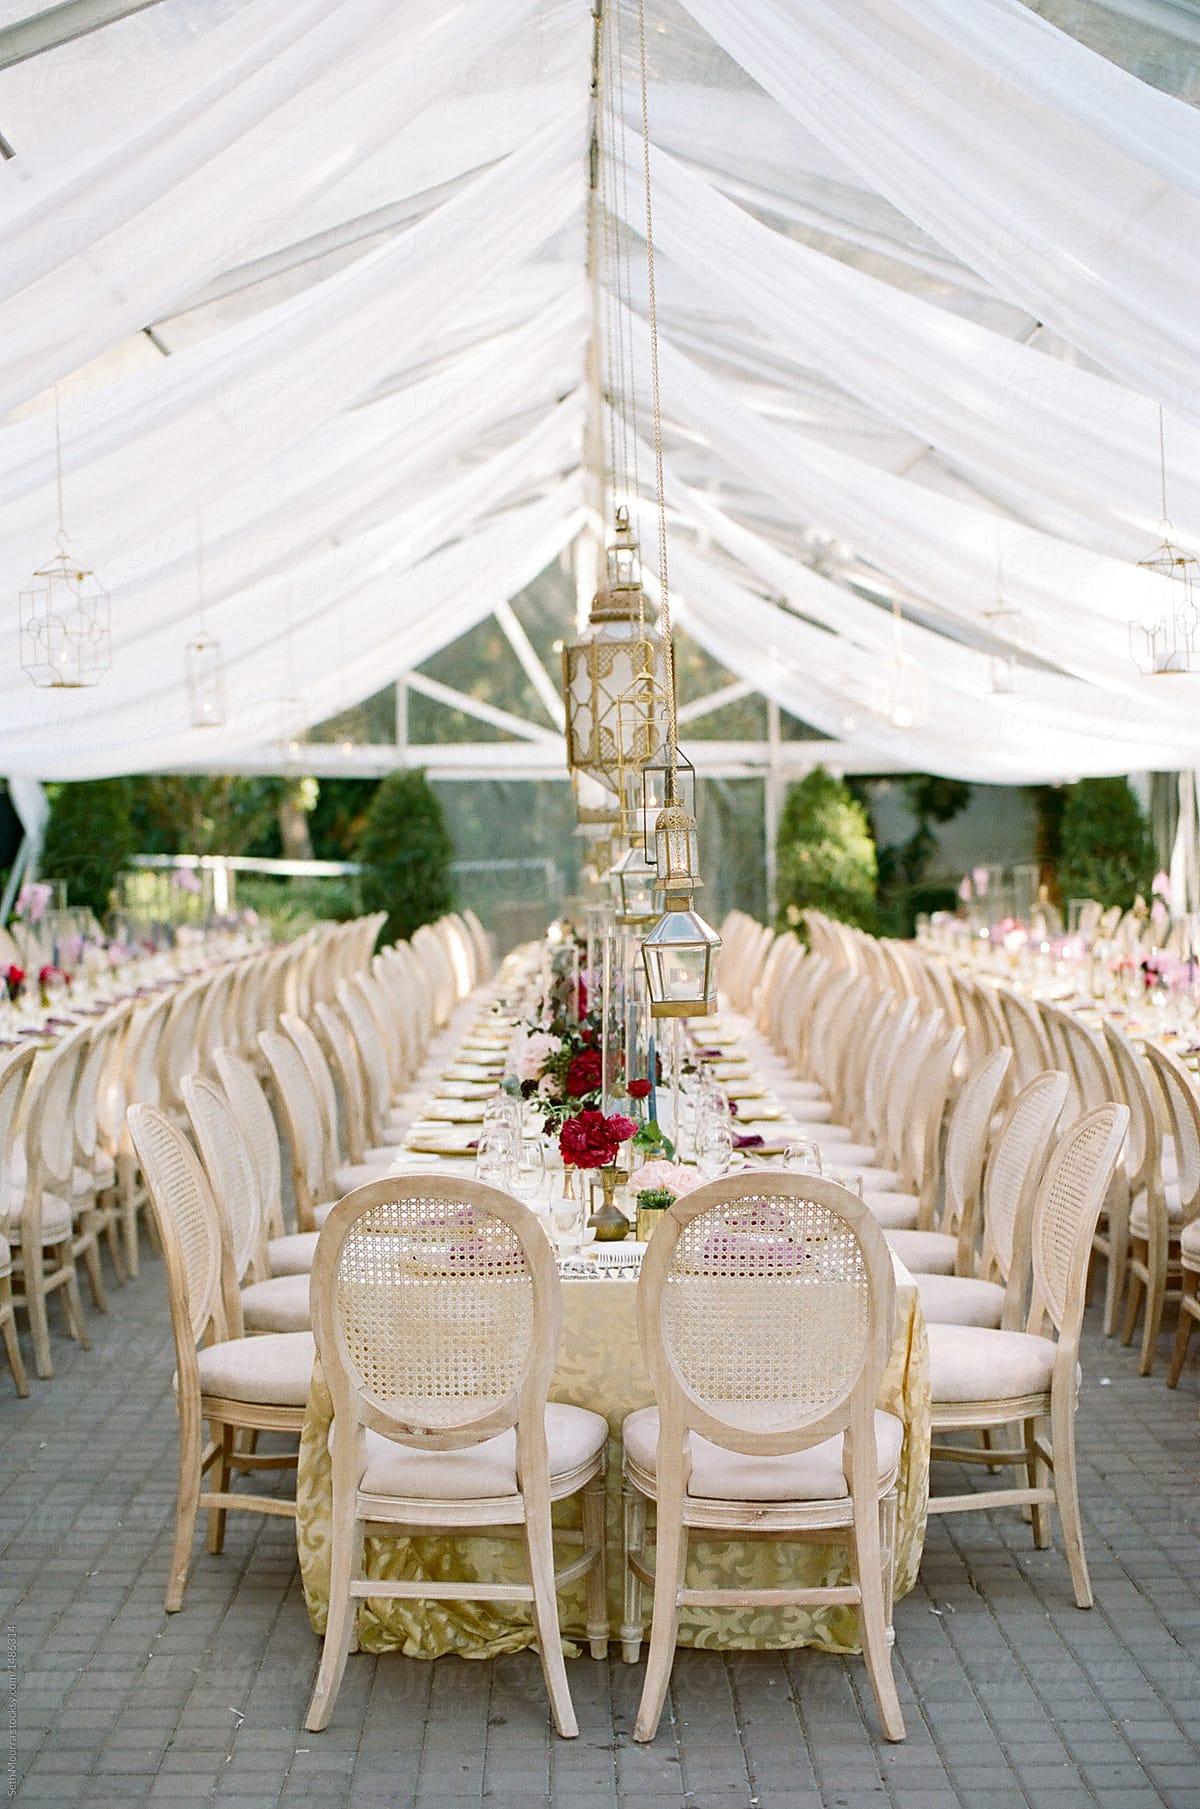 Exotic golden wedding reception dinner by Seth Mourra - Dinner party, Wedding  reception - Stocksy United